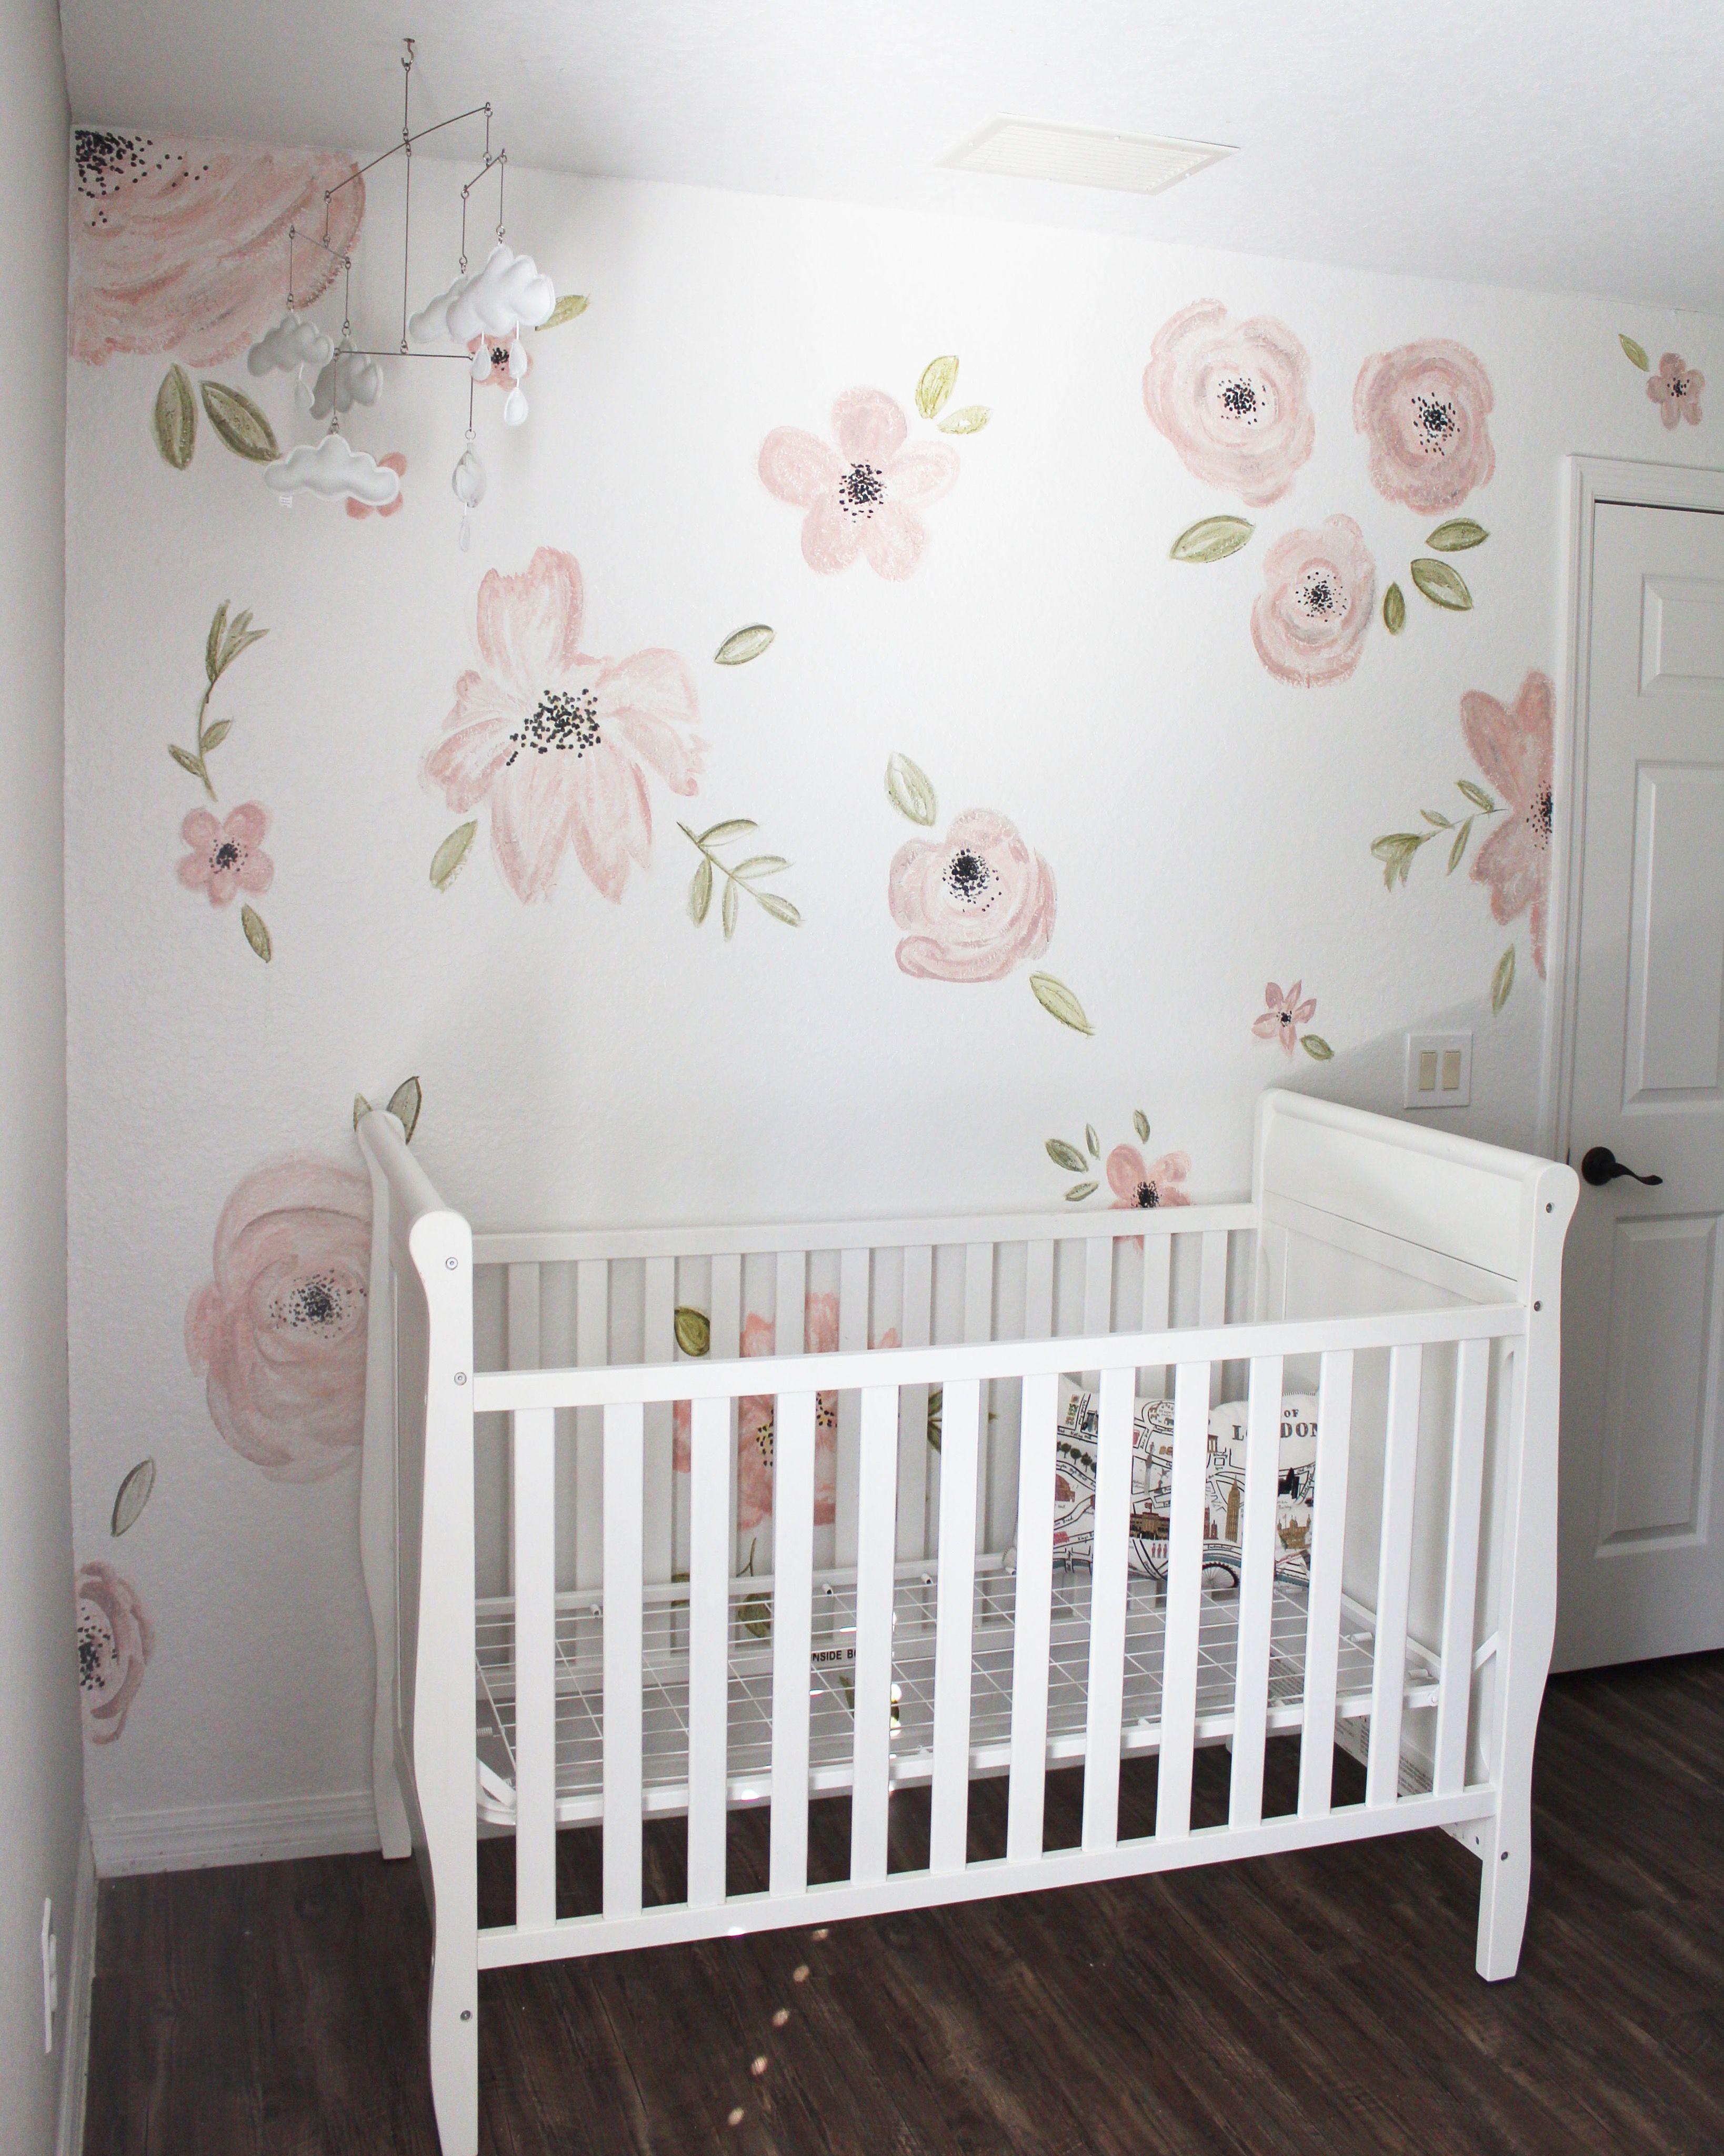 Painted Flower Wall Nursery 3276x4096 Download Hd Wallpaper Wallpapertip